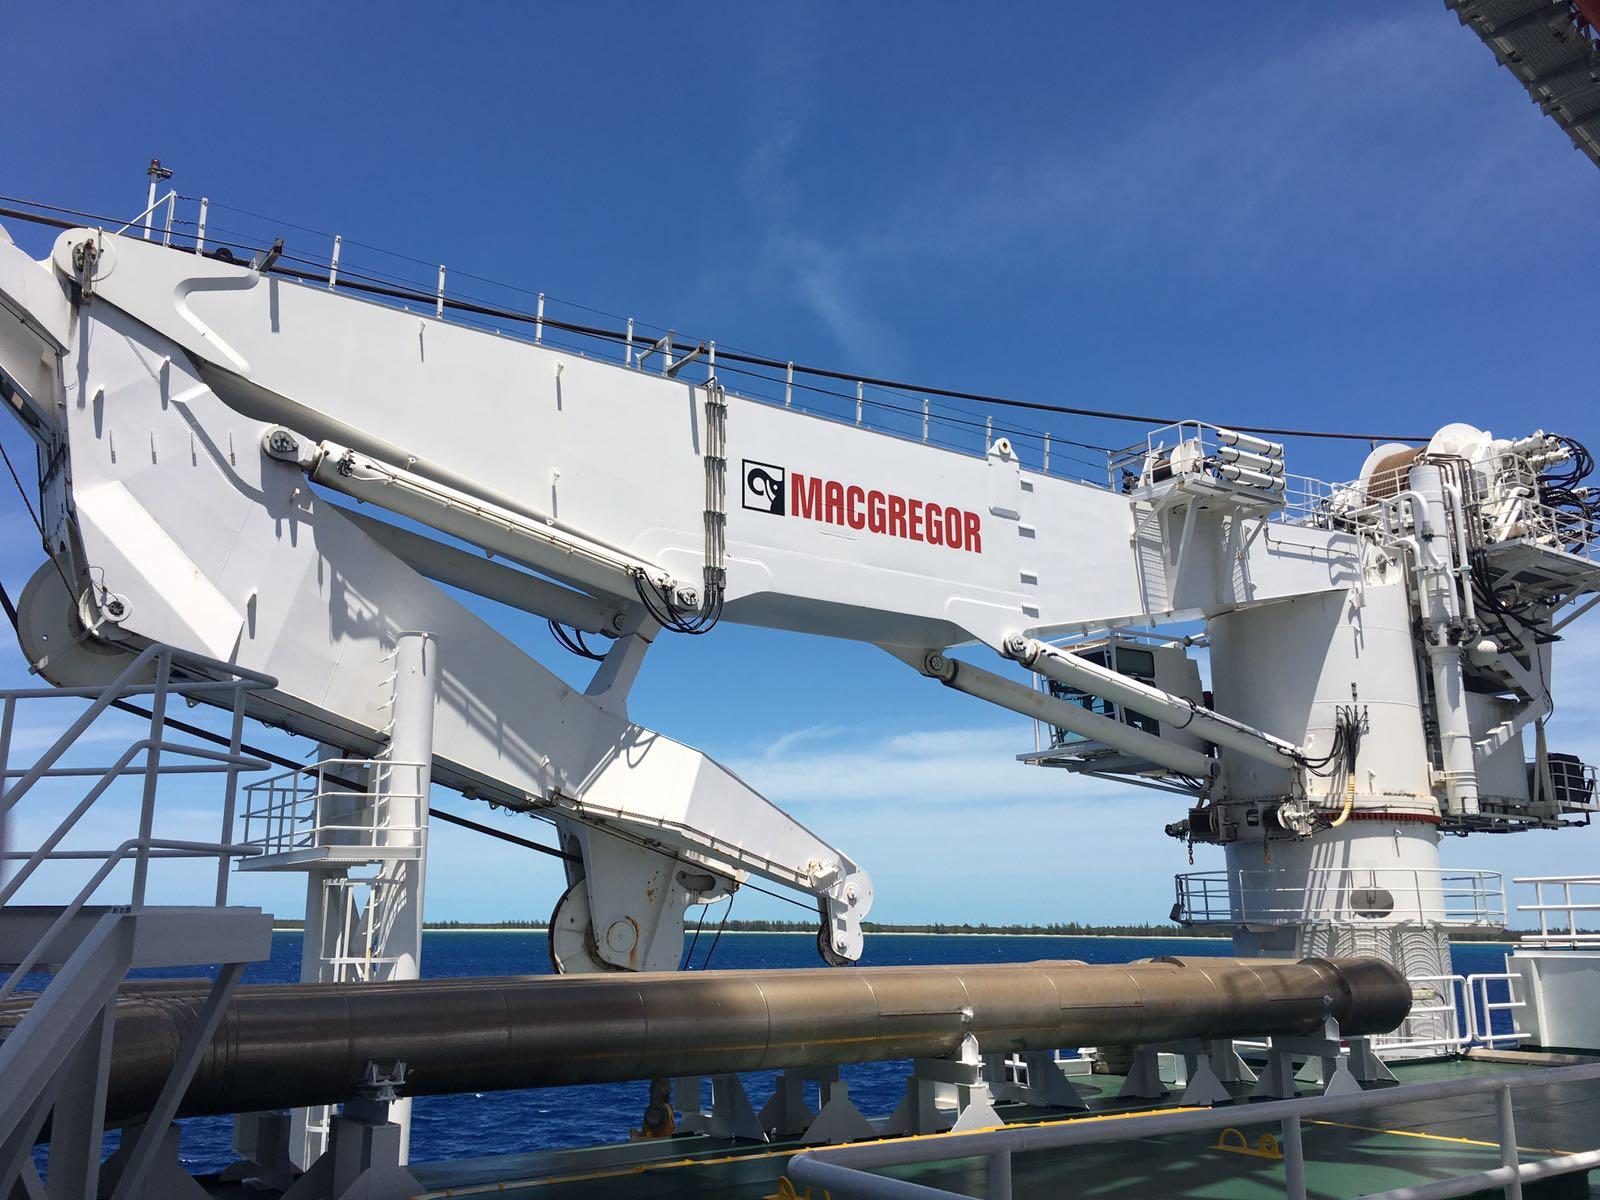 Telescopic Crane 200 Ton : Offshore crane find here cranes and port